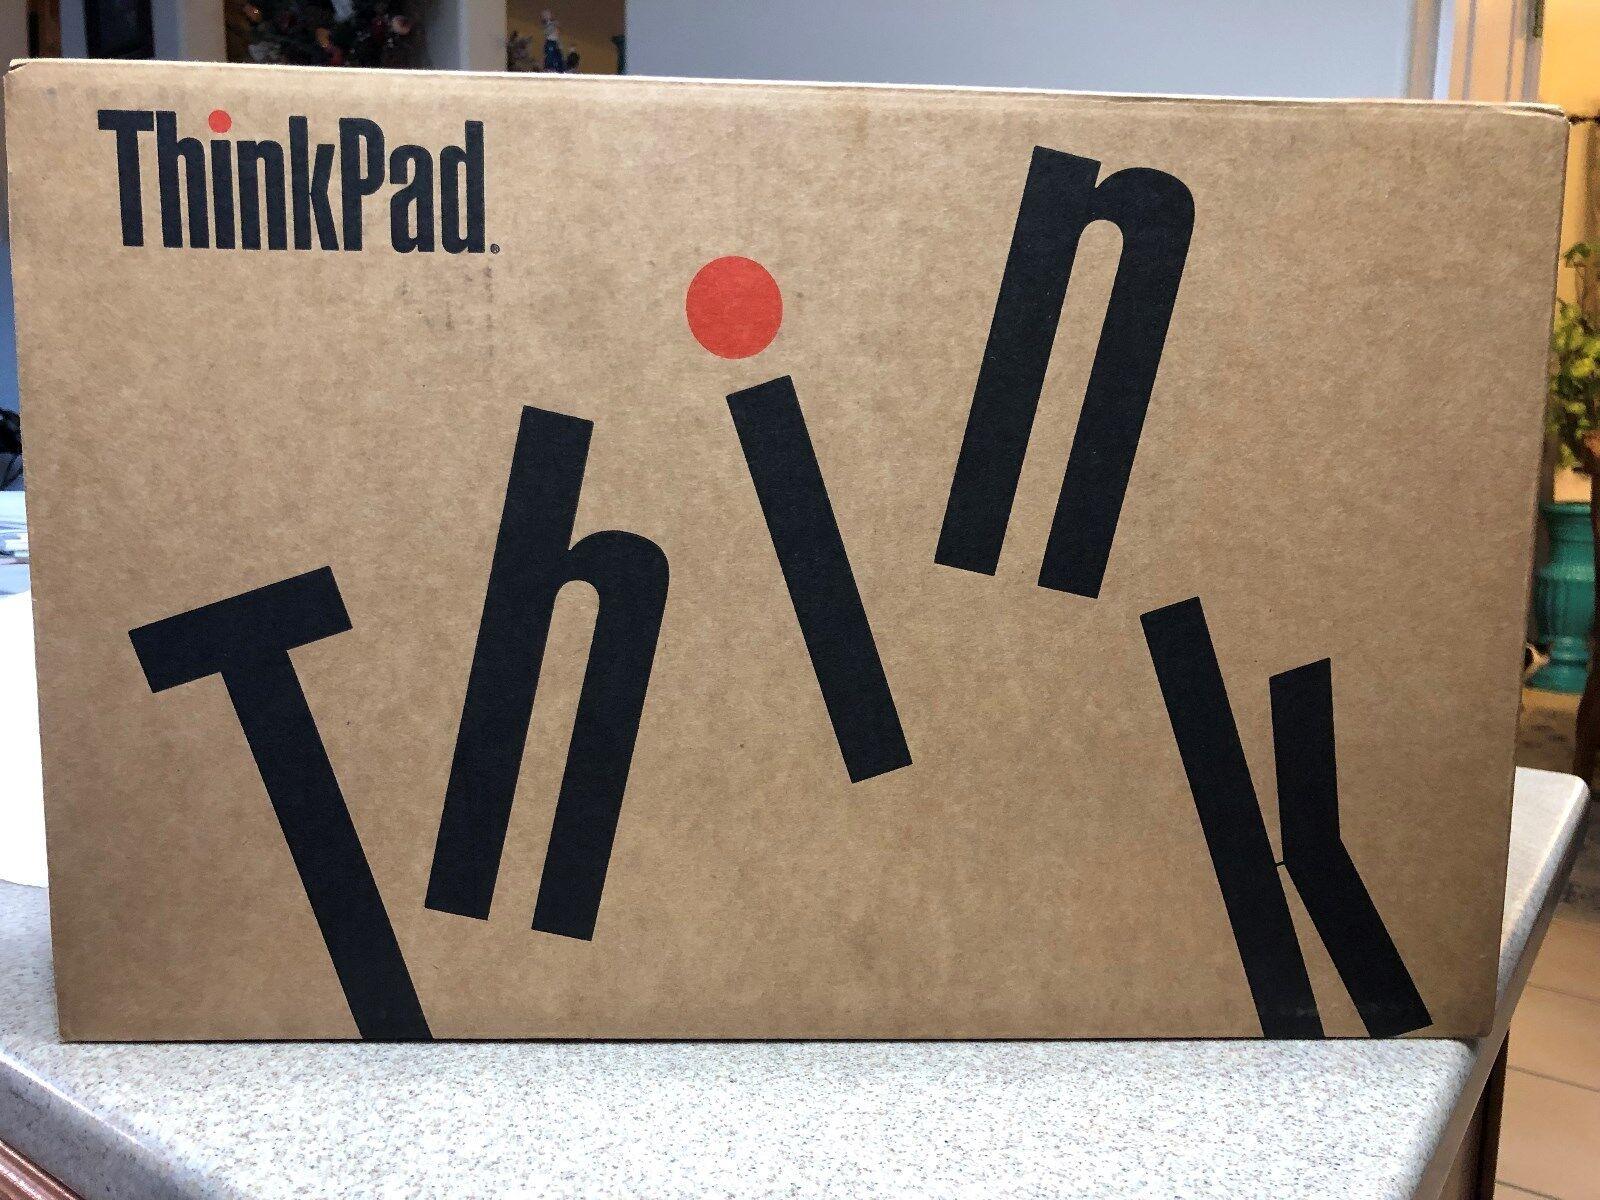 Lenovo ThinkPad T480 i7-8650U 16GB 512GB SSD Win10 Pro T580 T470 x270 x280 P52